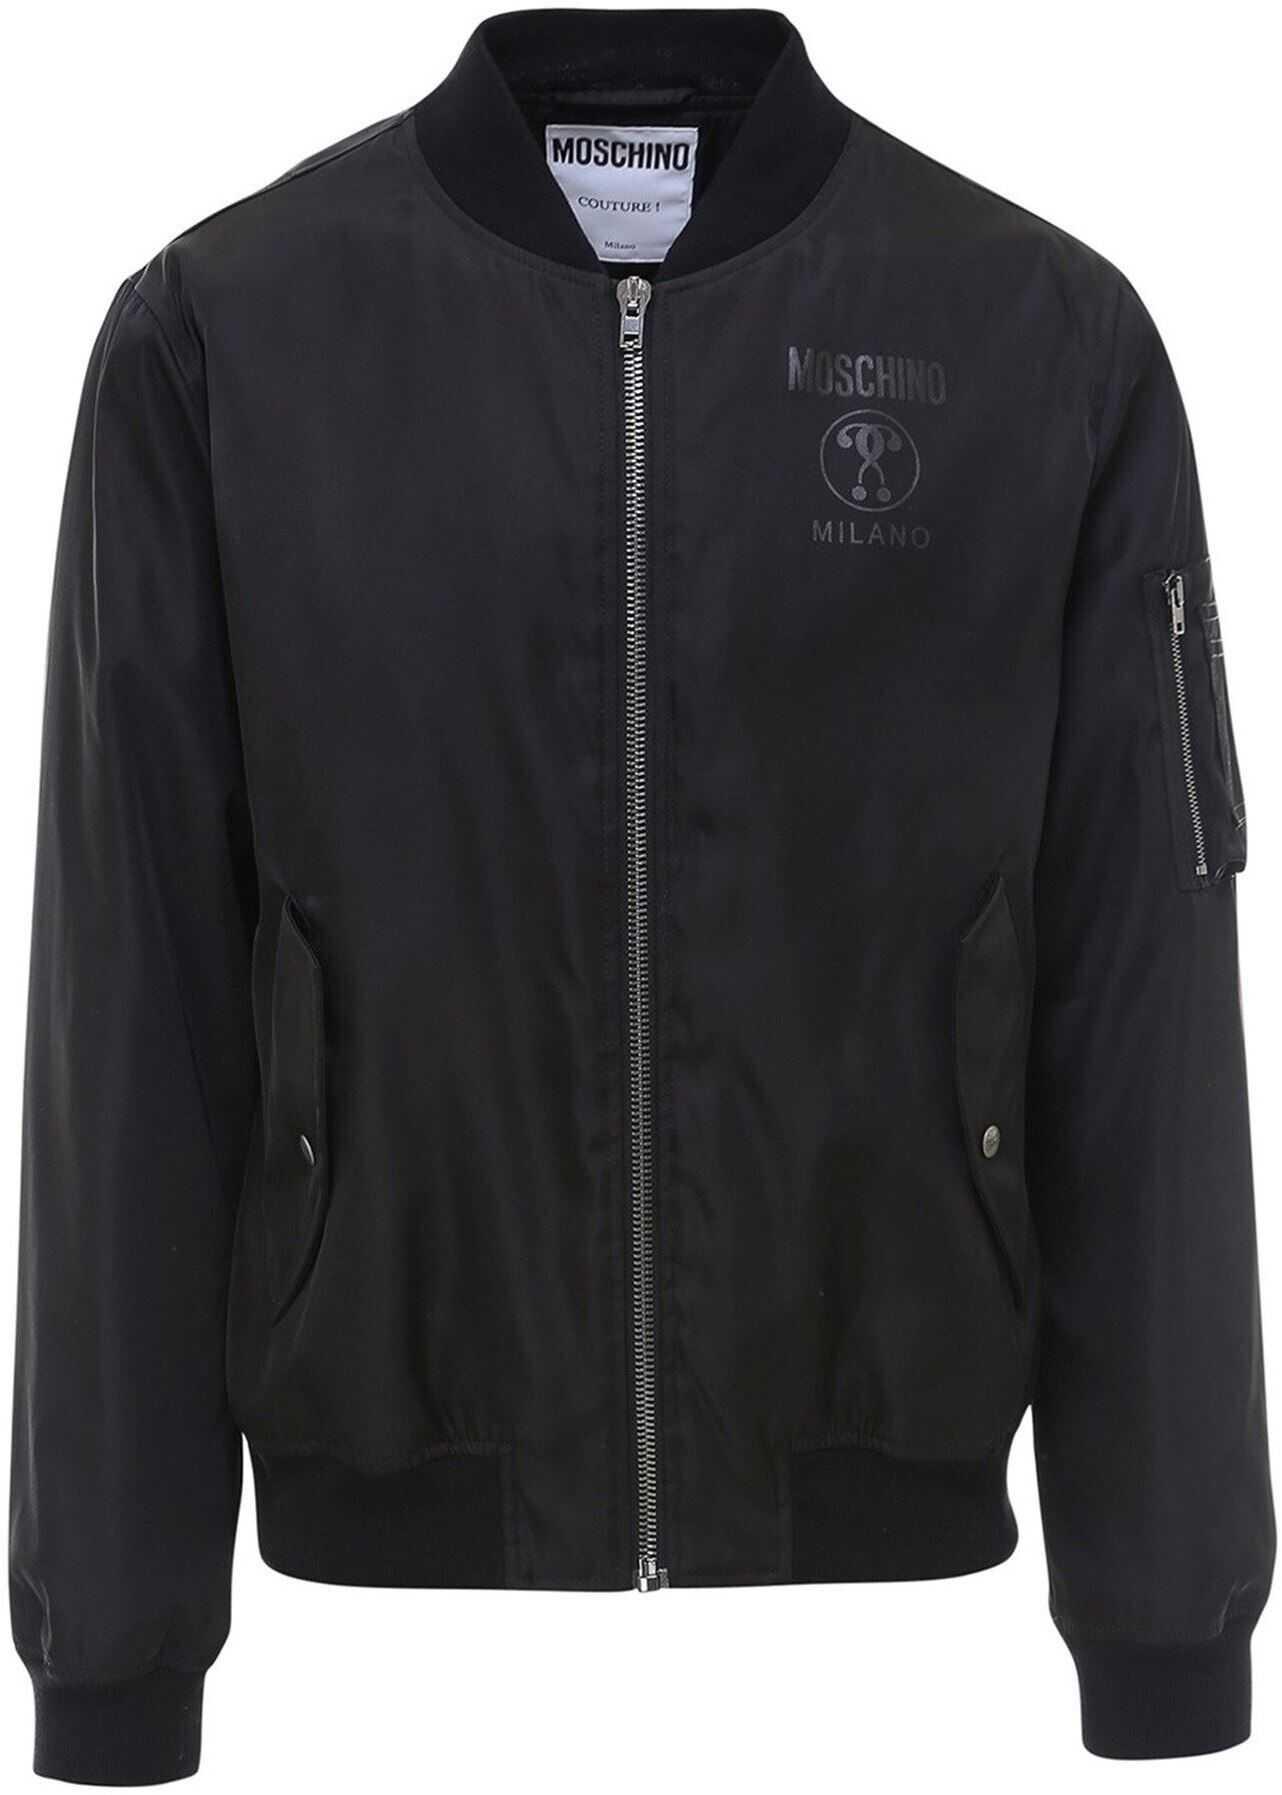 Moschino Nylon Bomber Jacket In Black Black imagine